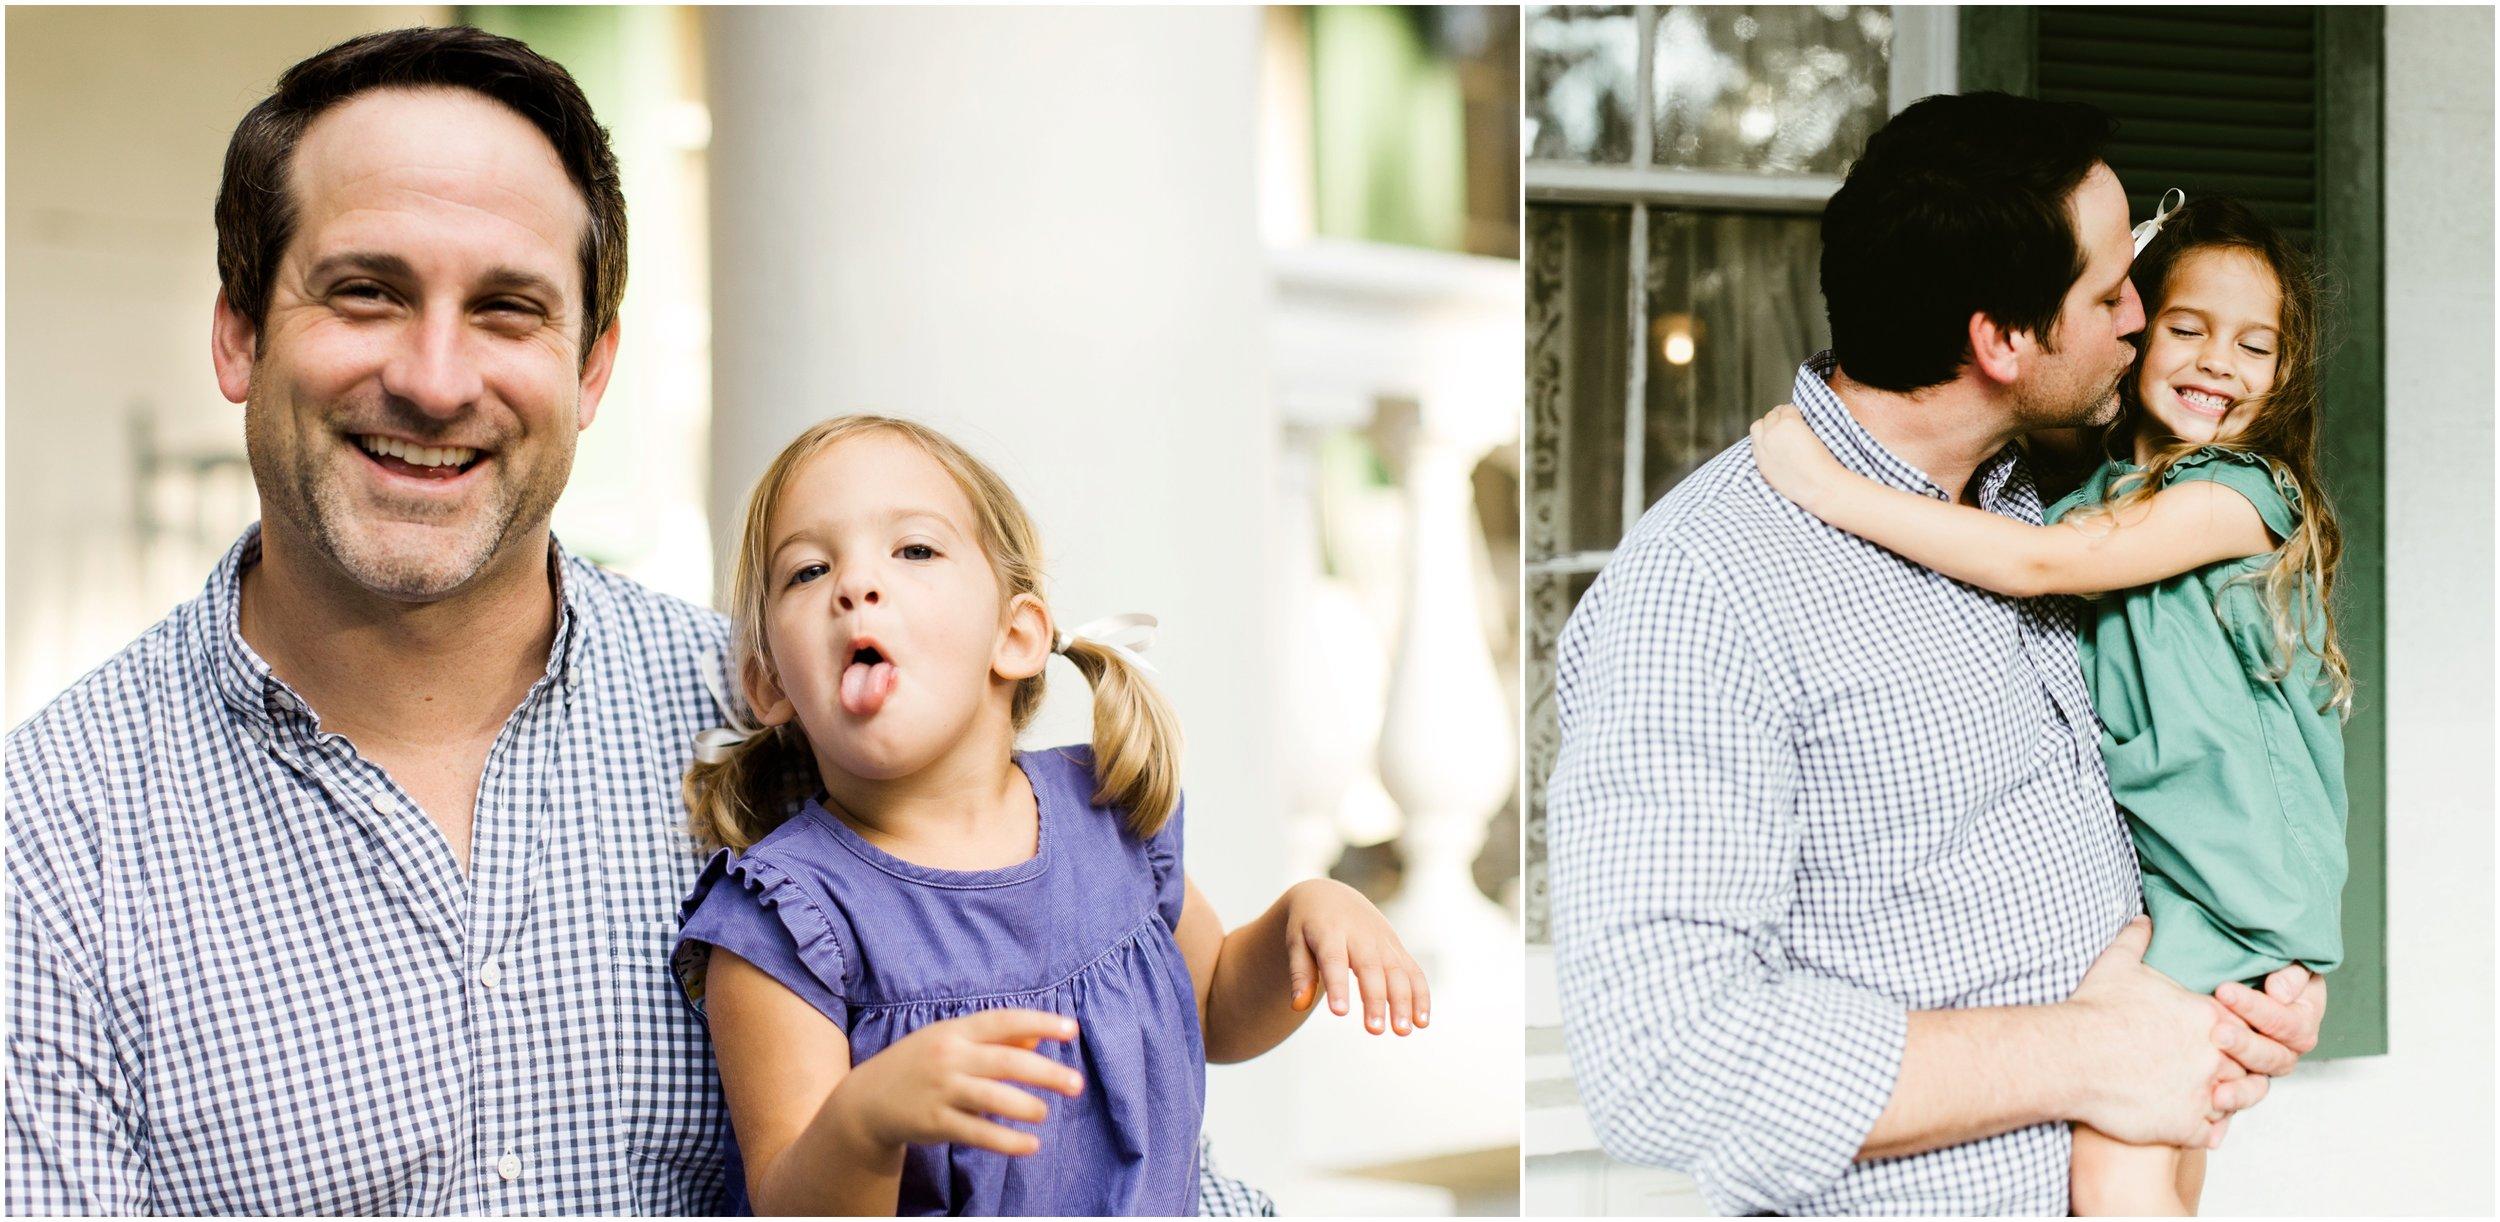 Hebert-2017-November-Family-Session-9640_quaint-and-whim-lifestyle-photographer-louisiana-.jpg